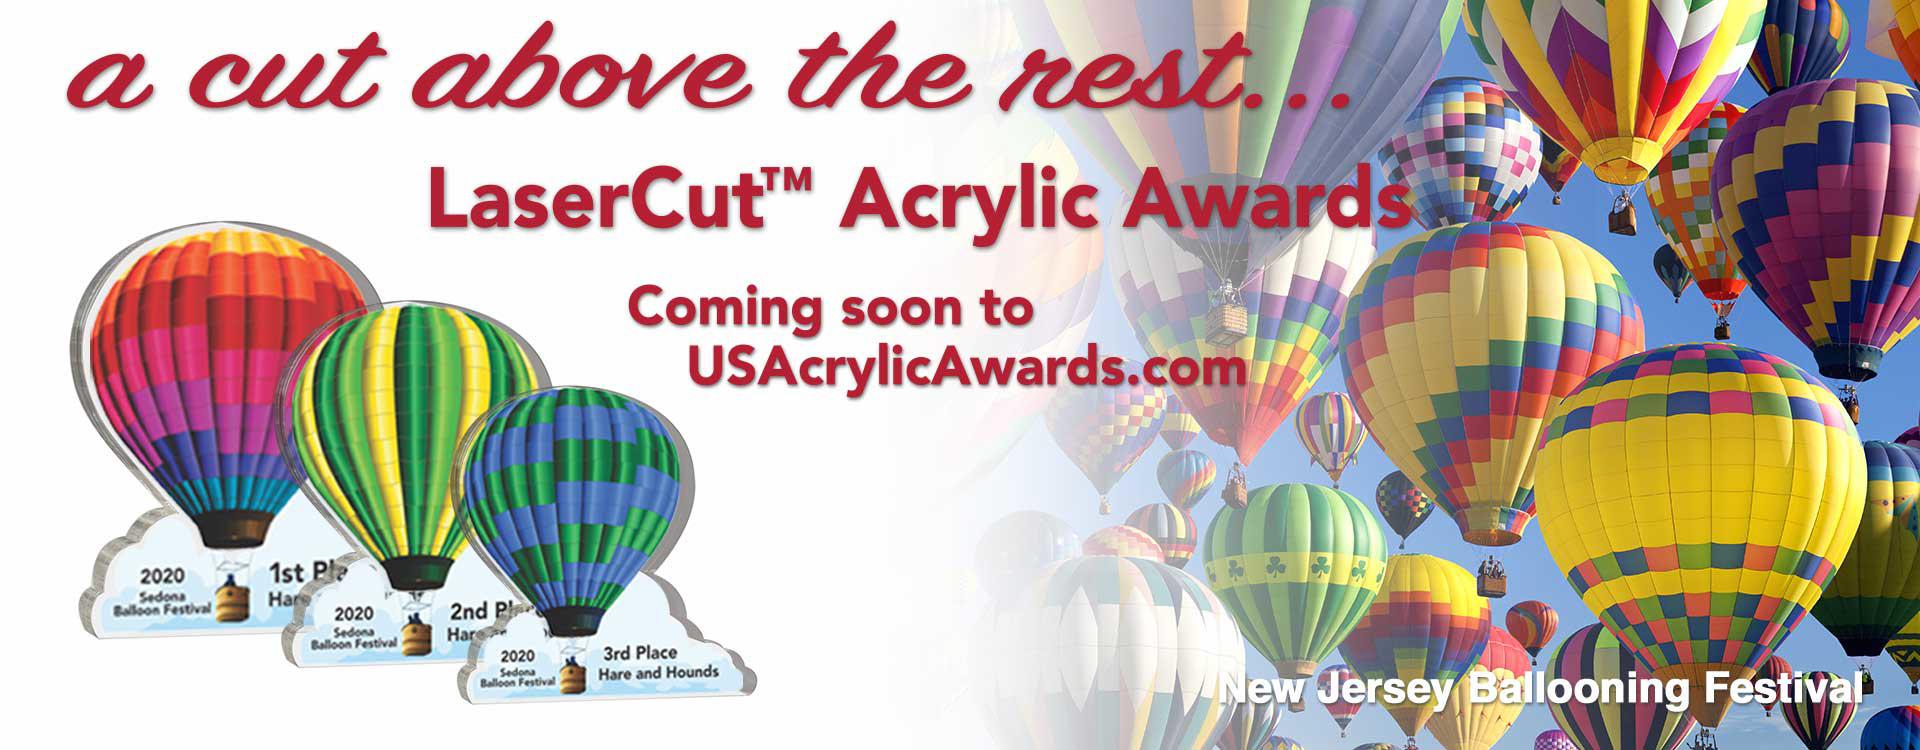 LaserCut™ hot air ballon acrylic awards displayed over hundreds of floating hot air balloons at New Jersey Balloon Festival.